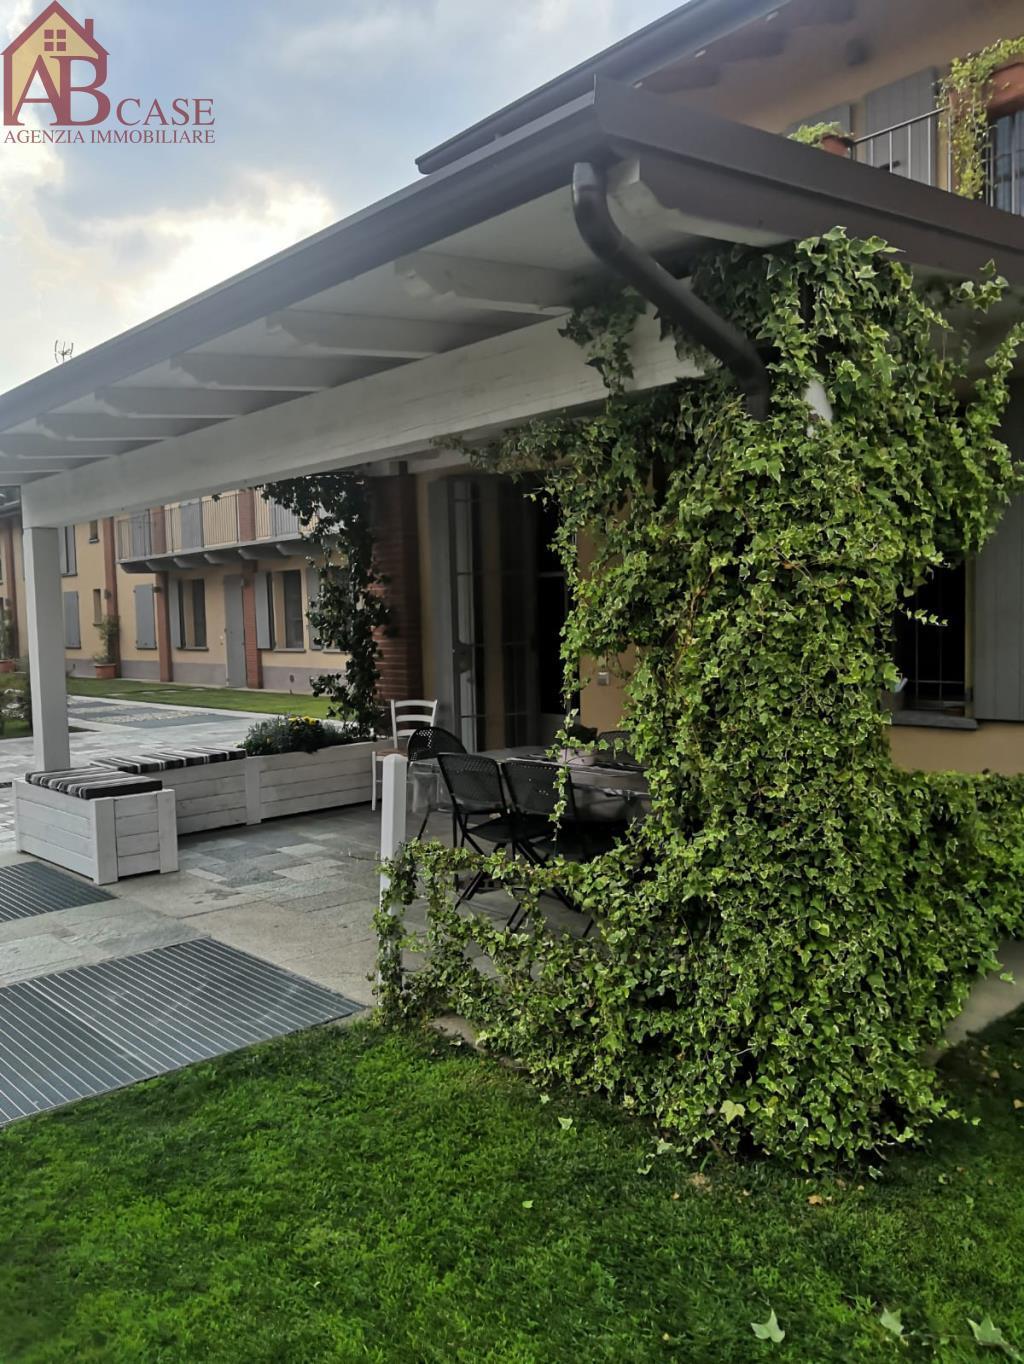 Vendita Casa Indipendente Casa/Villa Albairate   236408